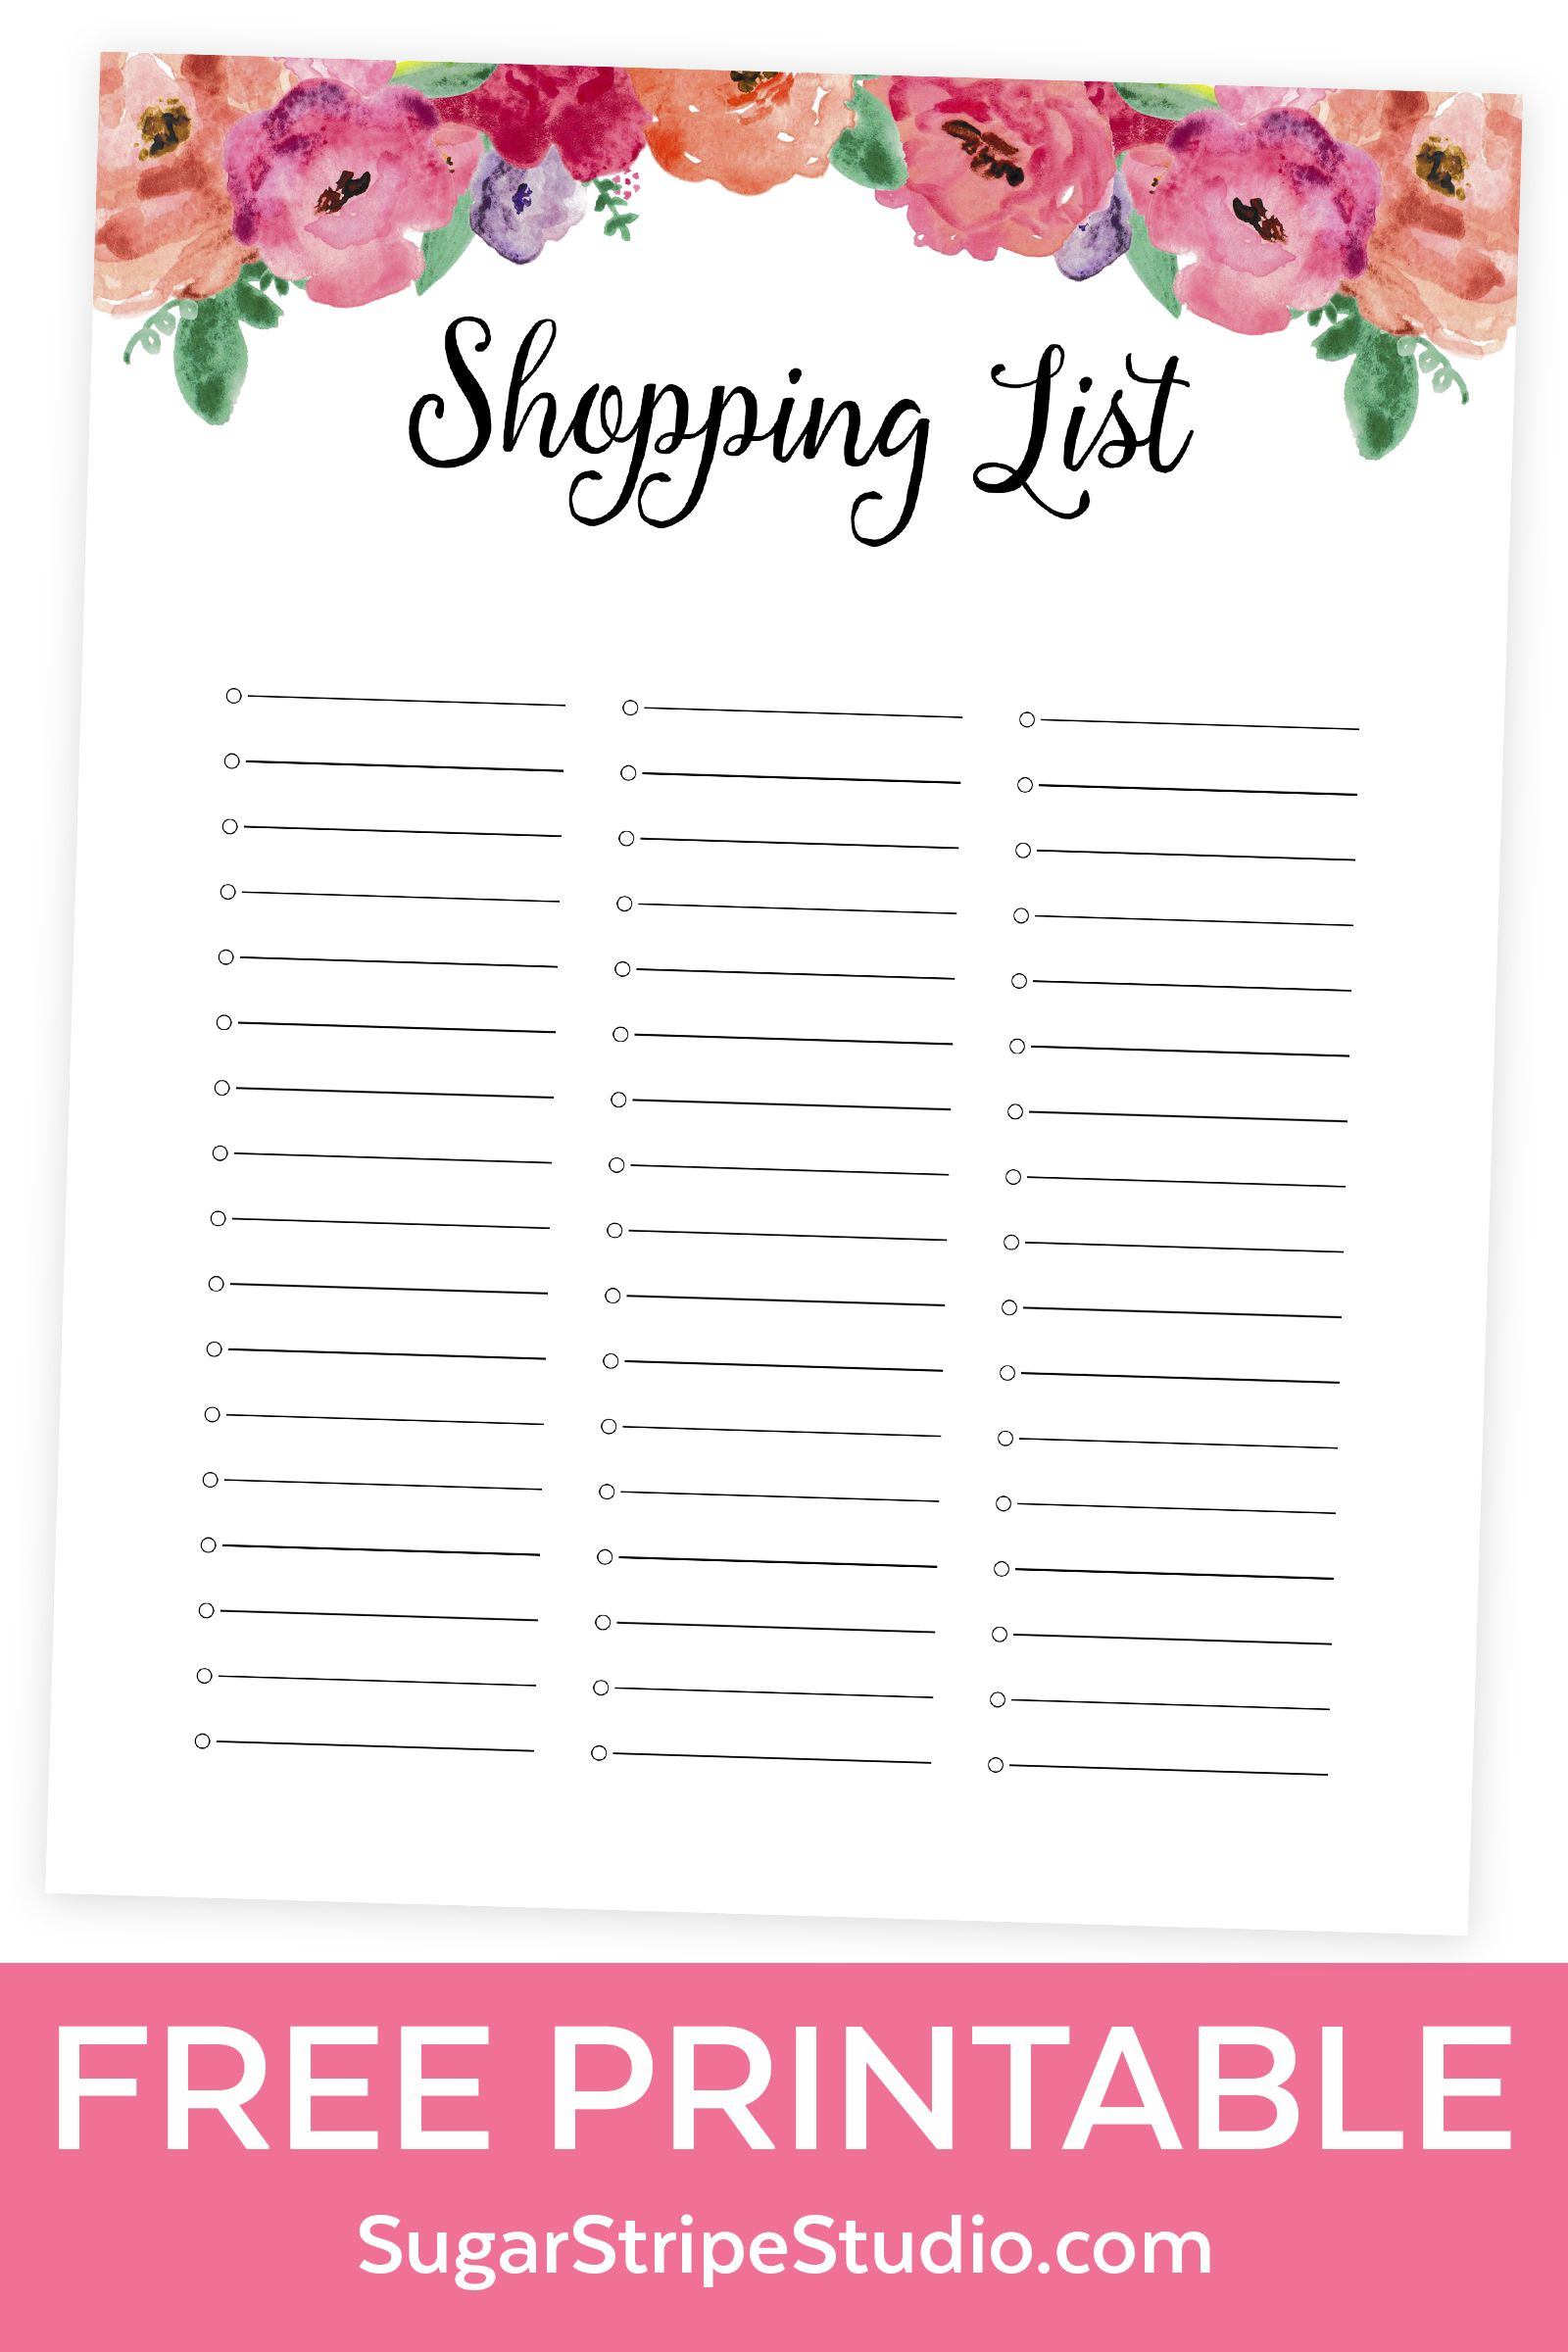 Free Printable Grocery List Free Shopping List Printable